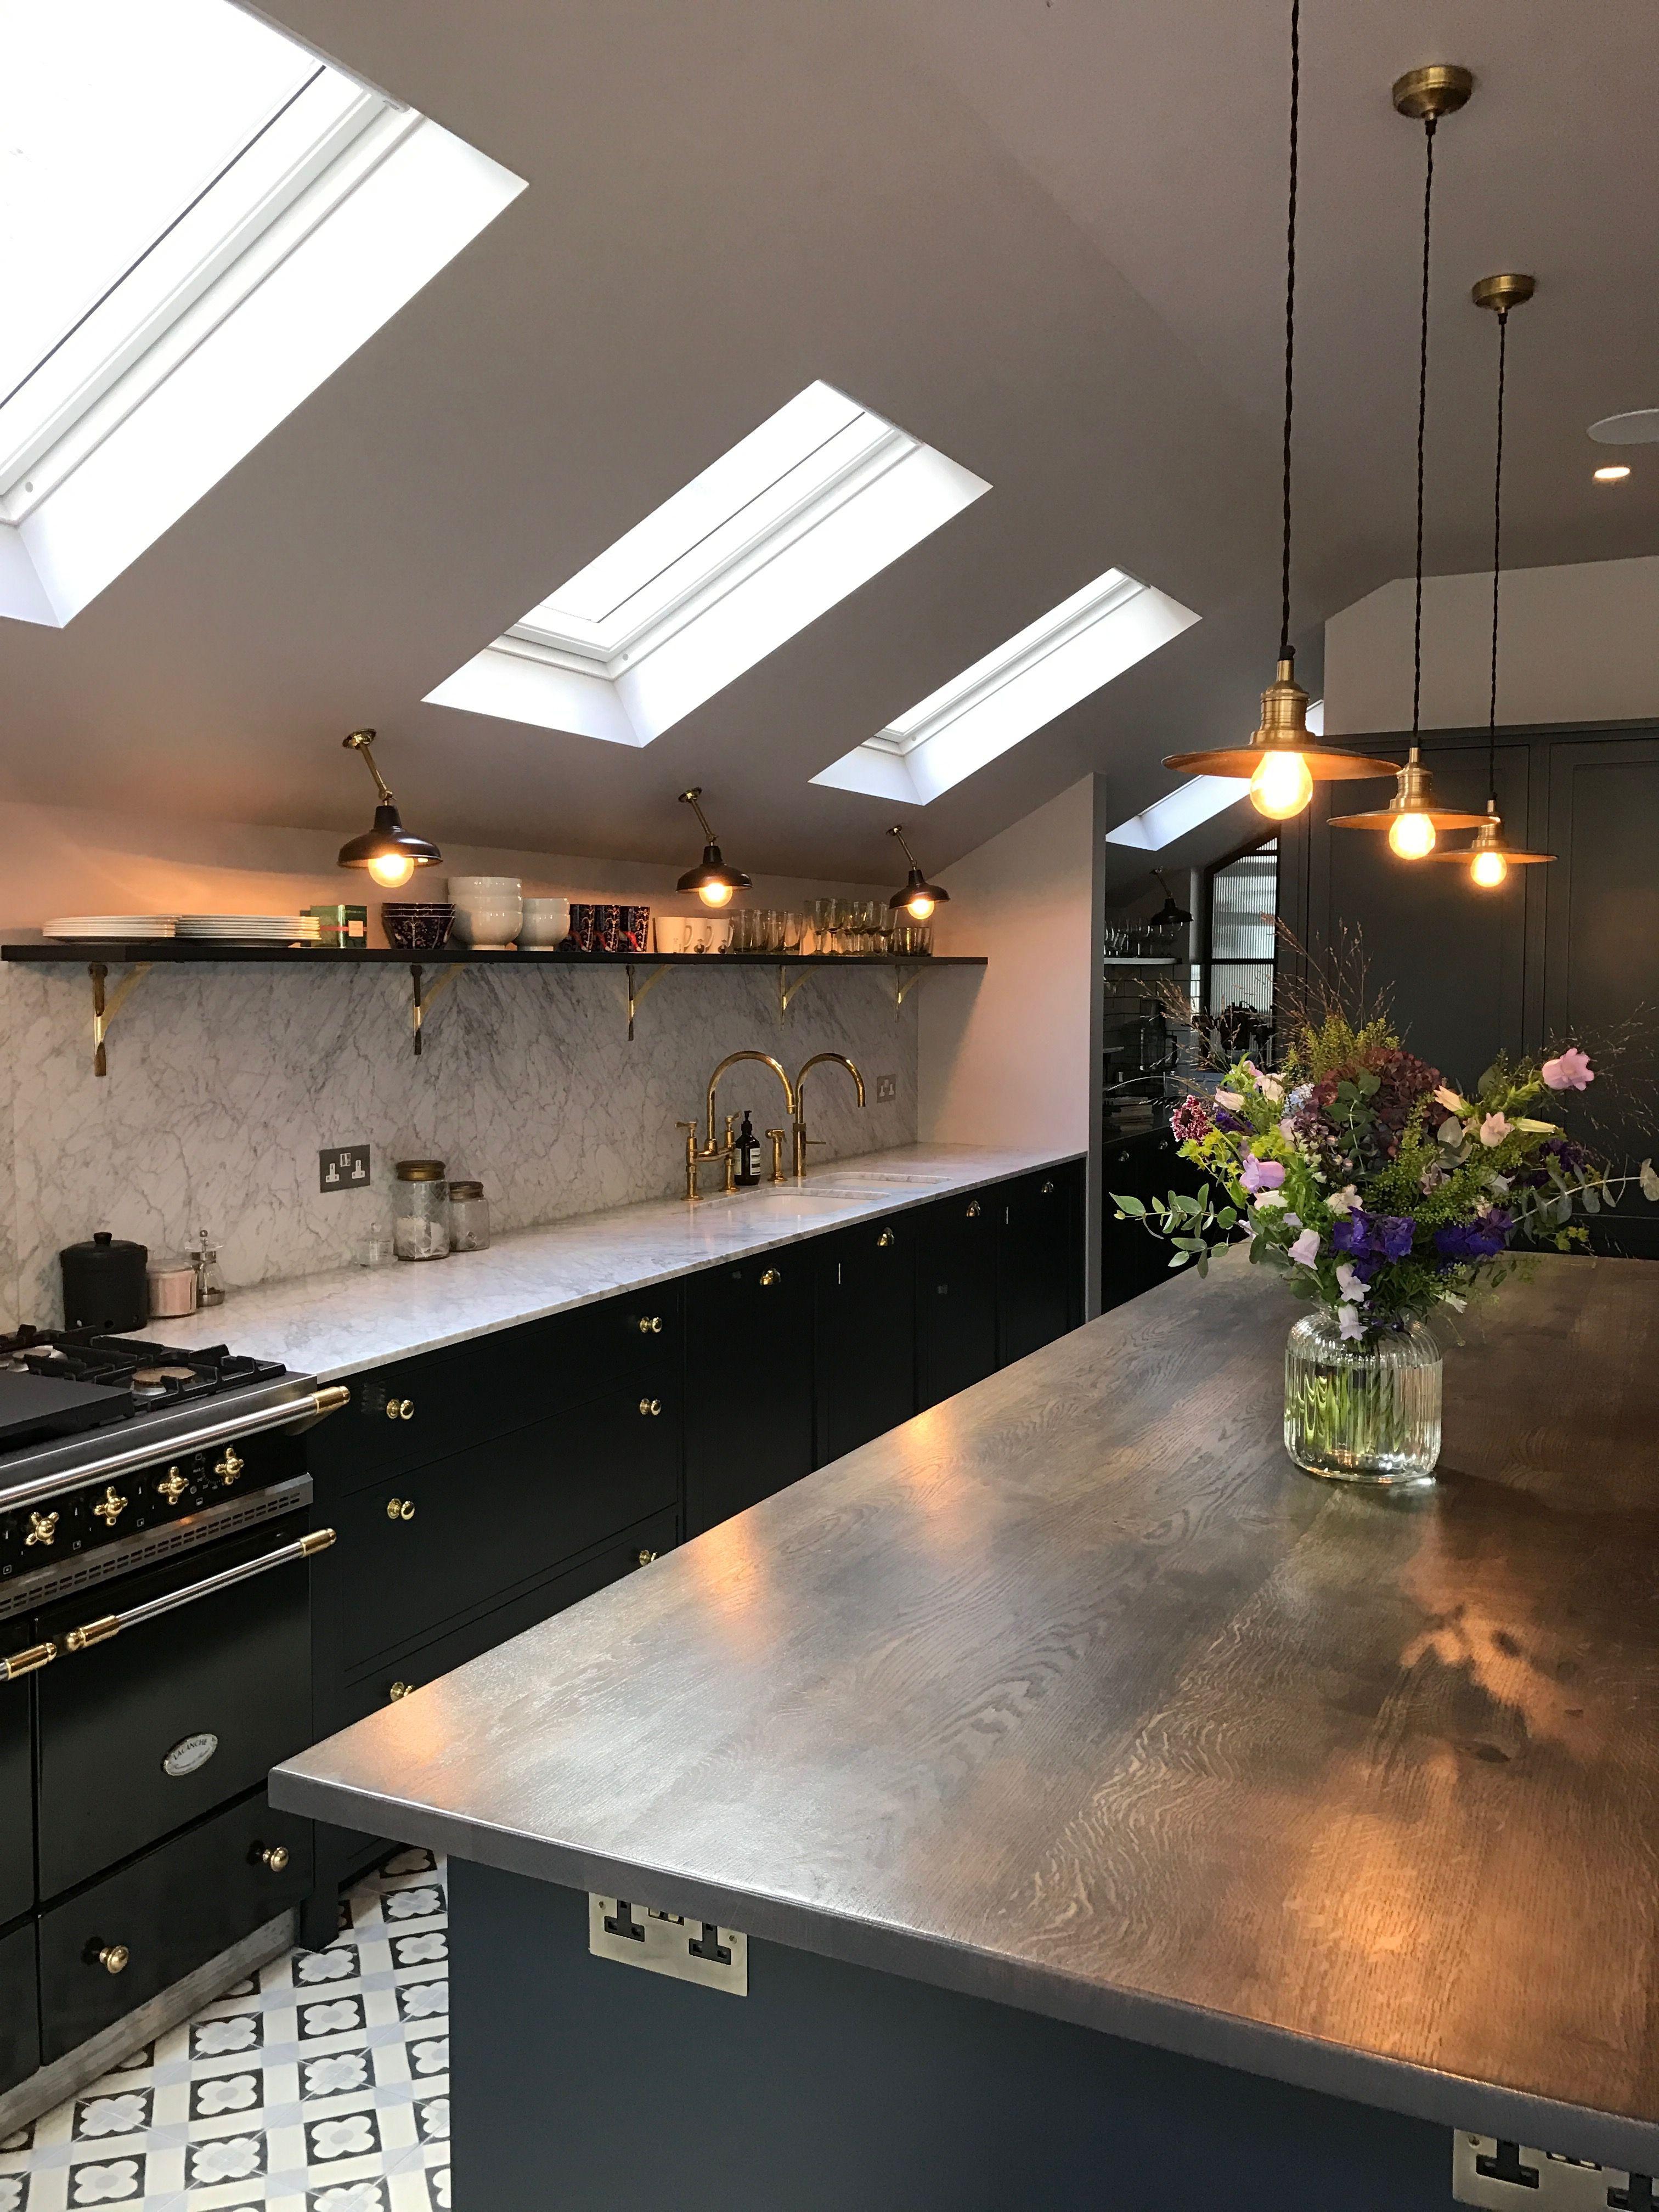 Bespoke kitchen by 202 design. Painted Shaker, farrow & Ball ...